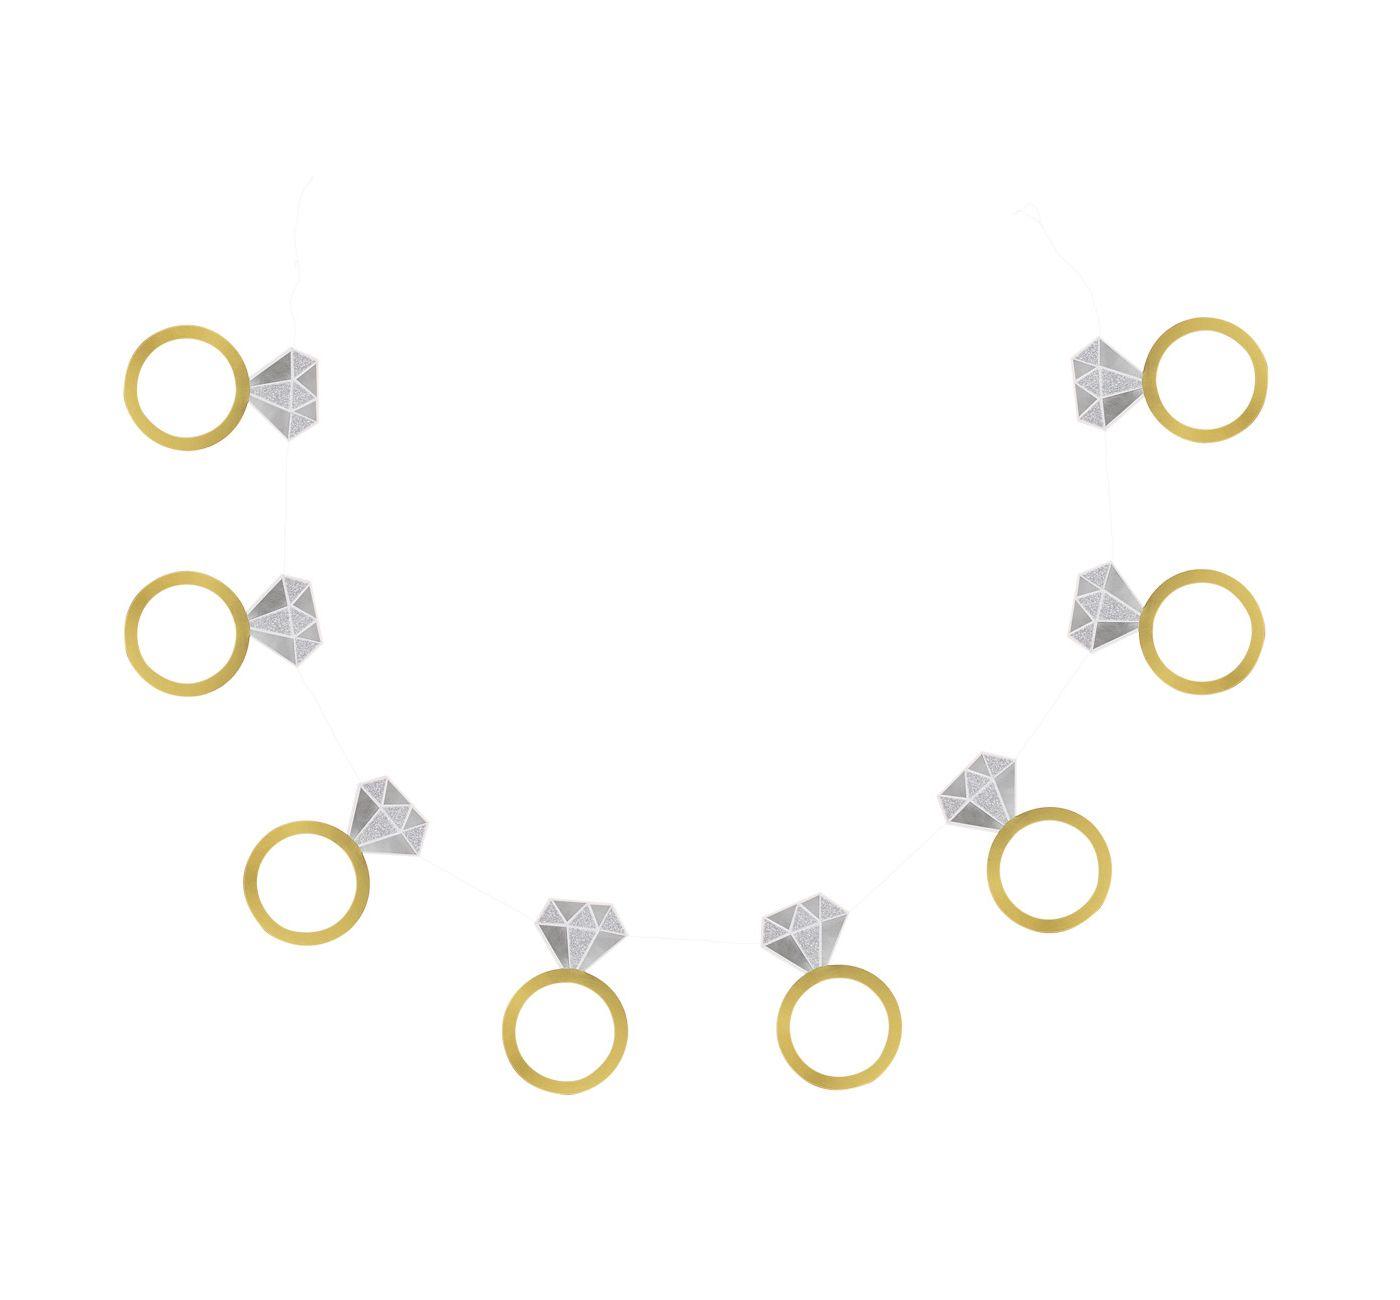 "60"" Engagement Ring Banner Gold - Spritz™ - image 1 of 1"